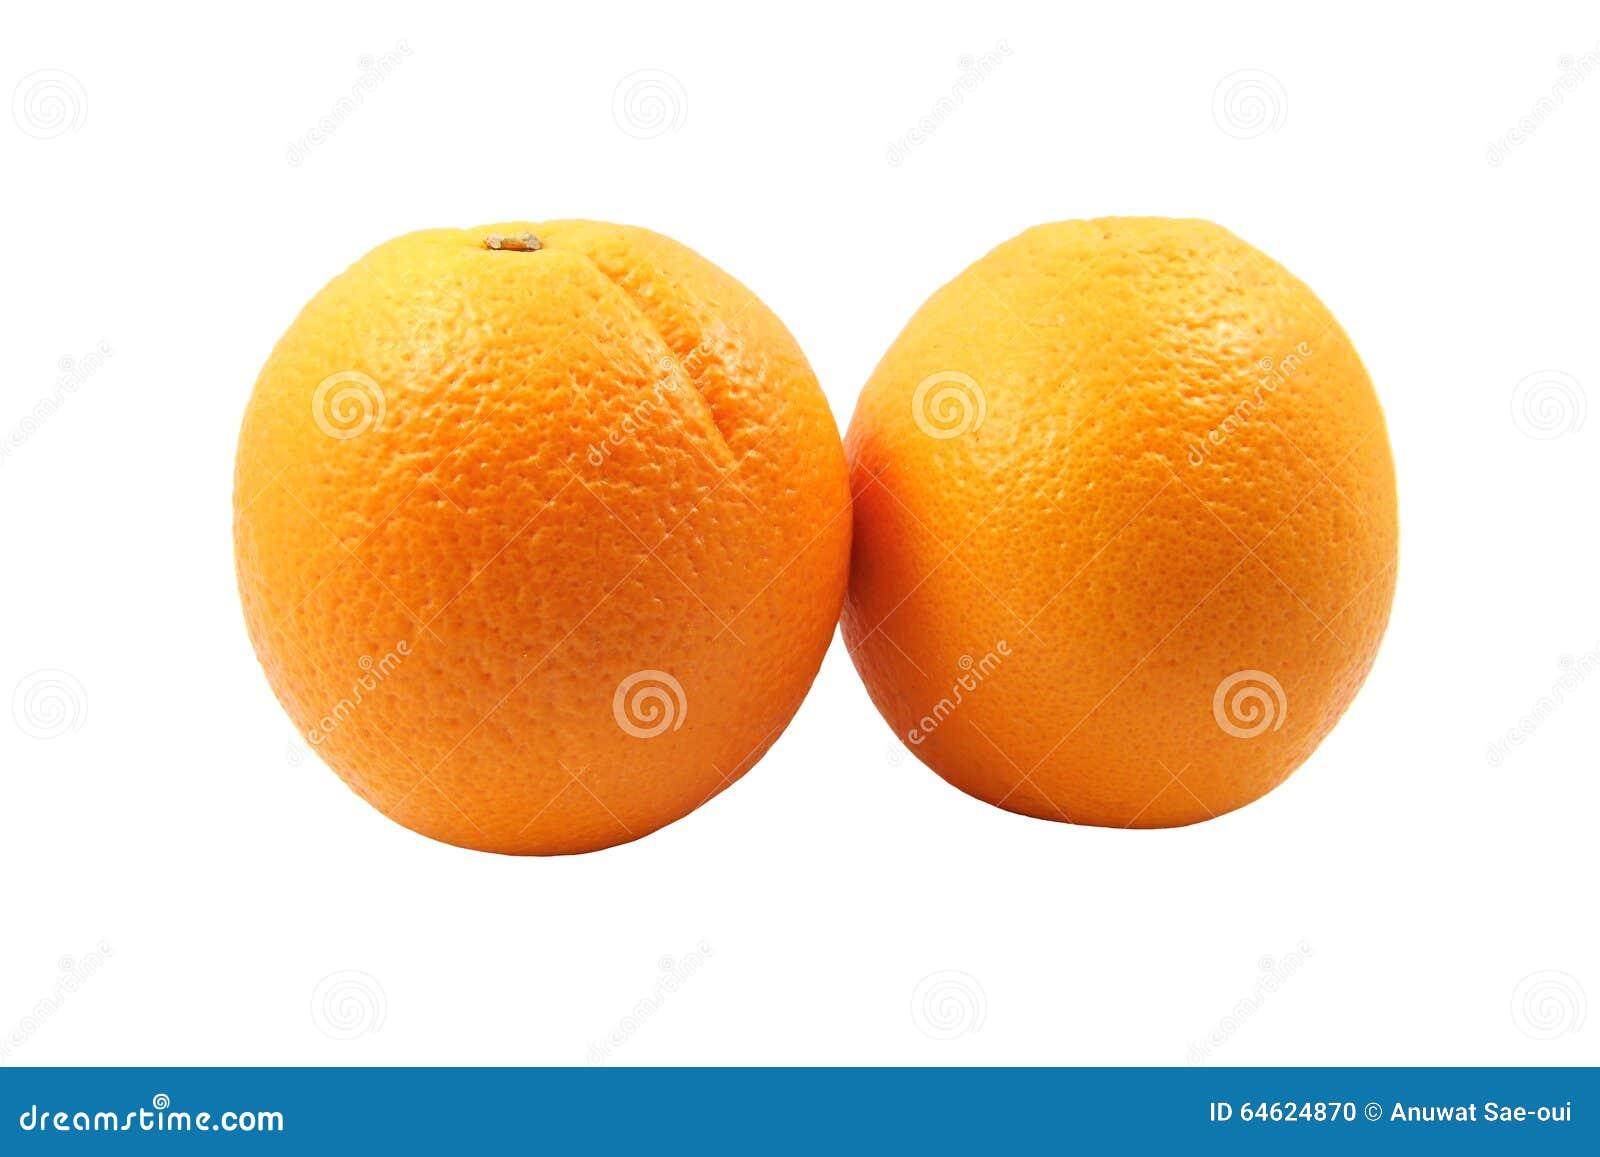 Verse Navelsinaasappel